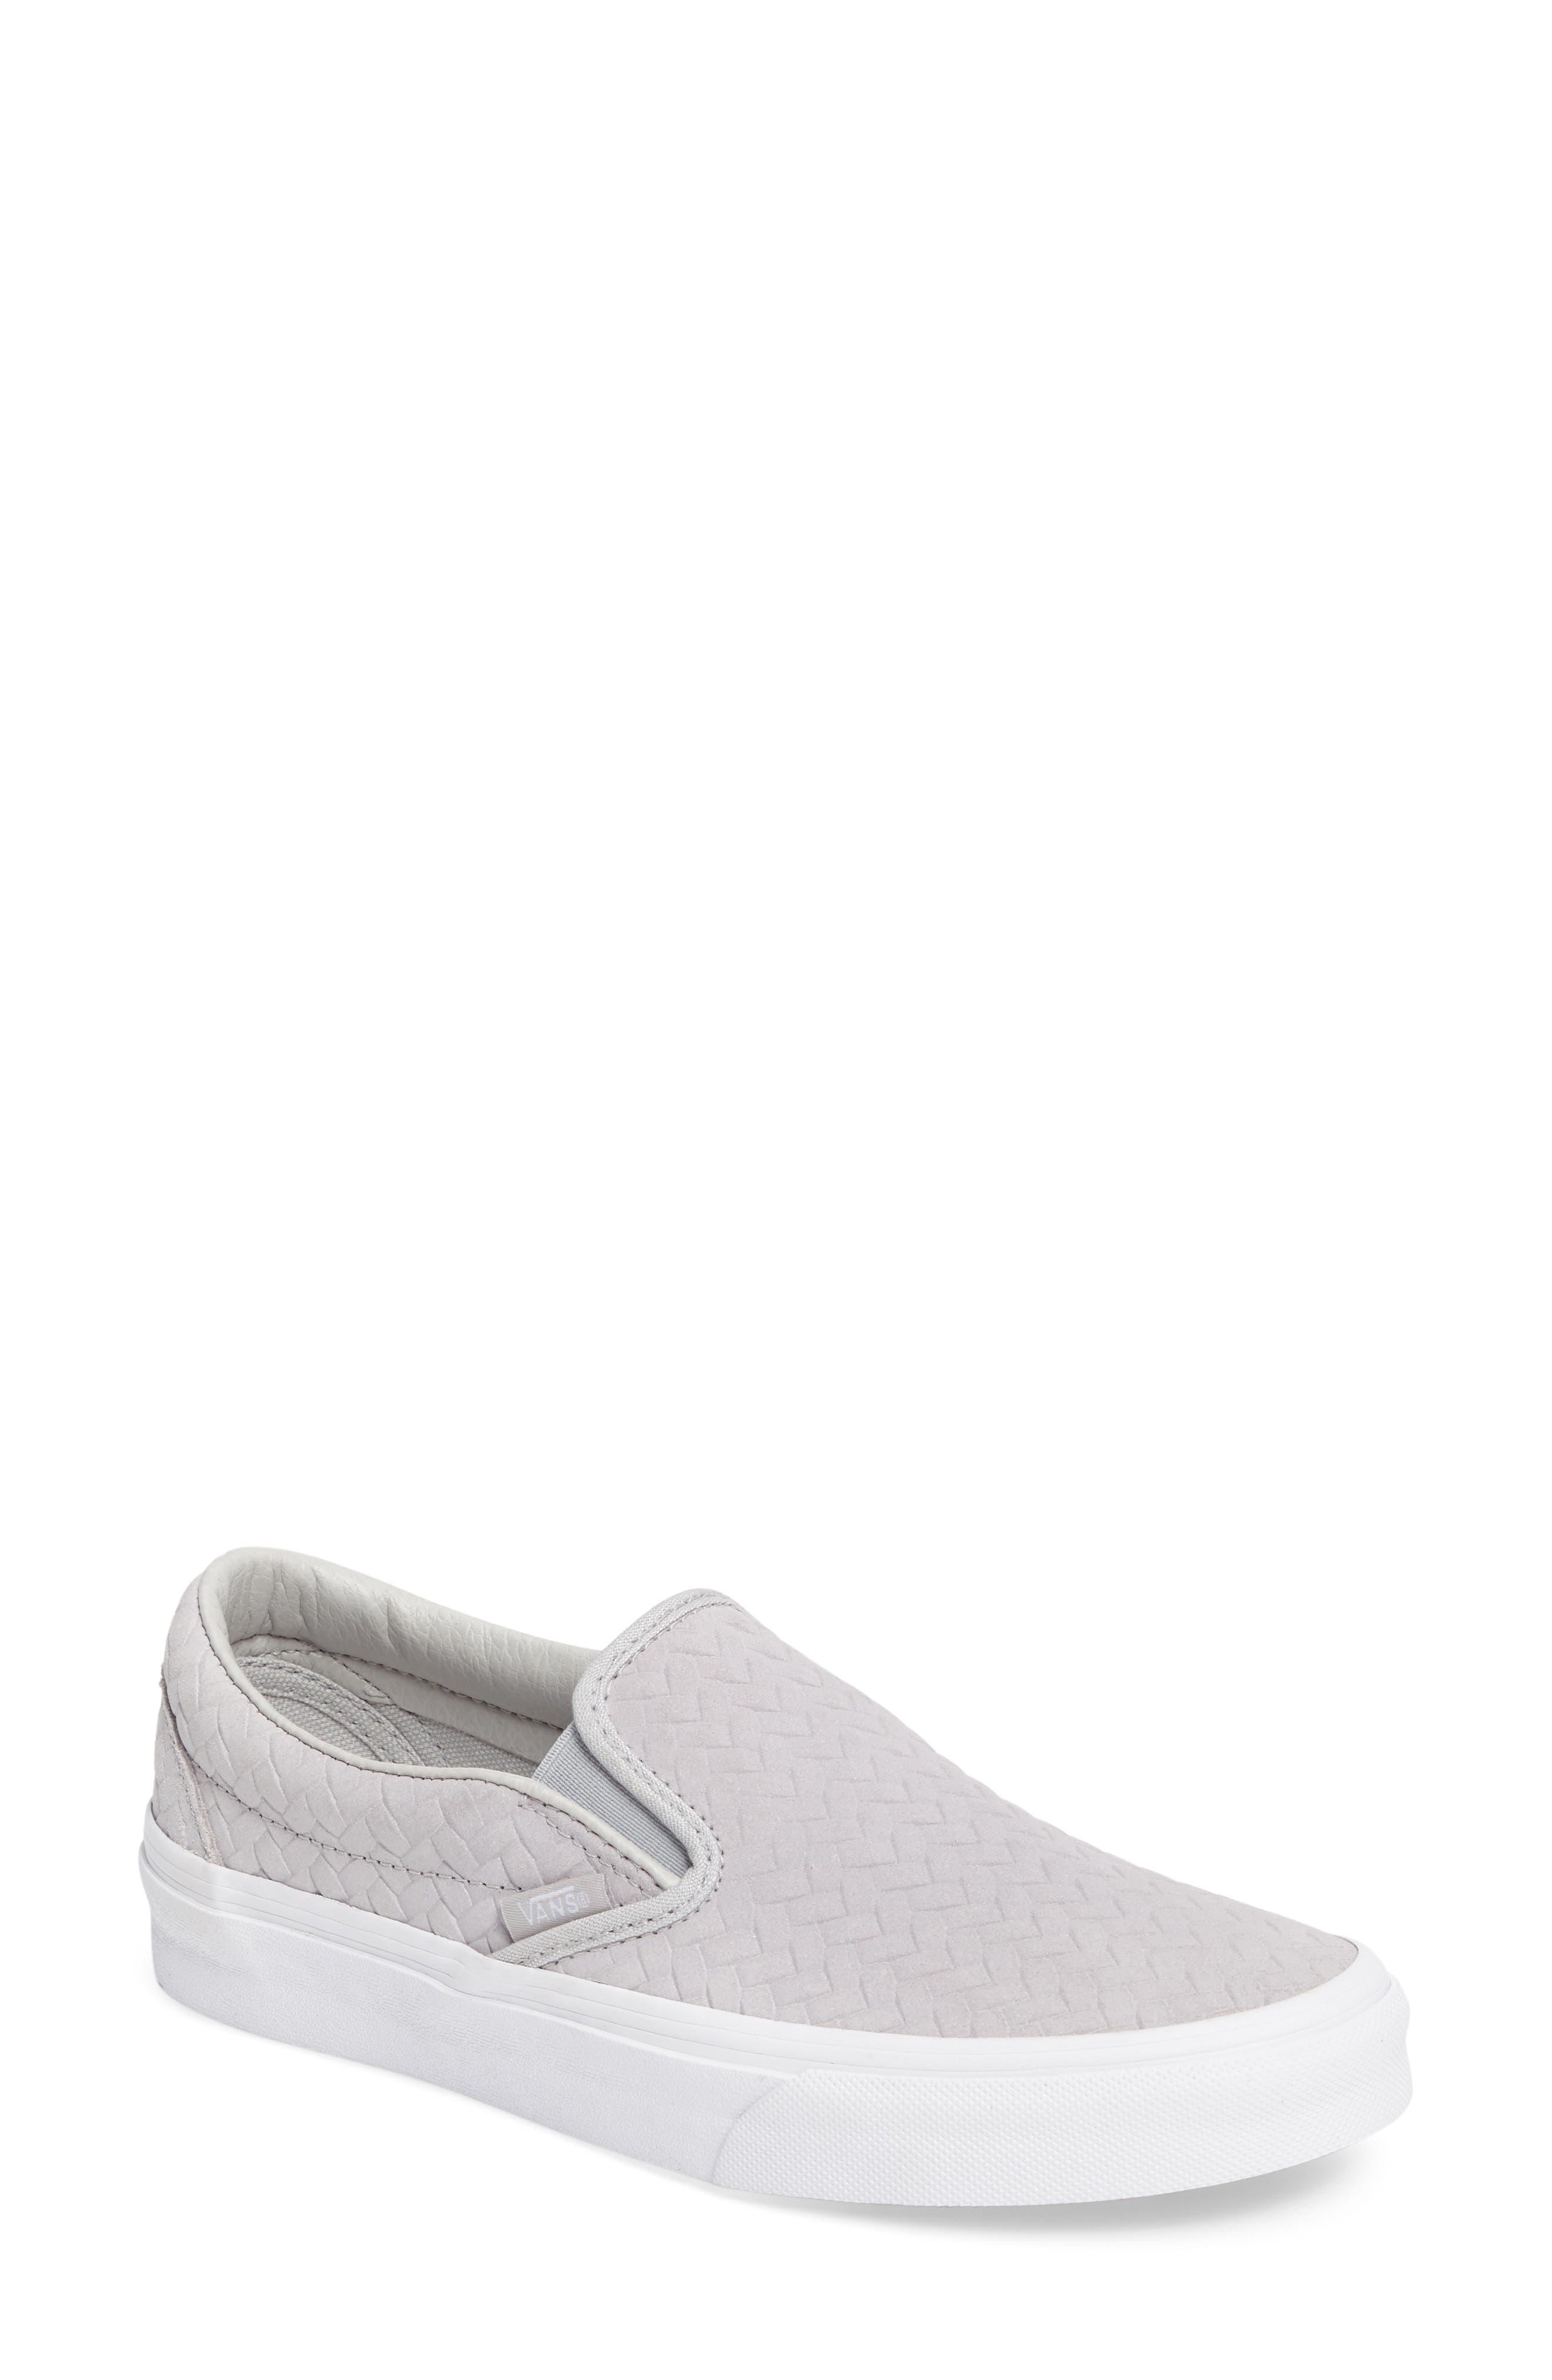 ,                             Classic Slip-On Sneaker,                             Main thumbnail 265, color,                             023